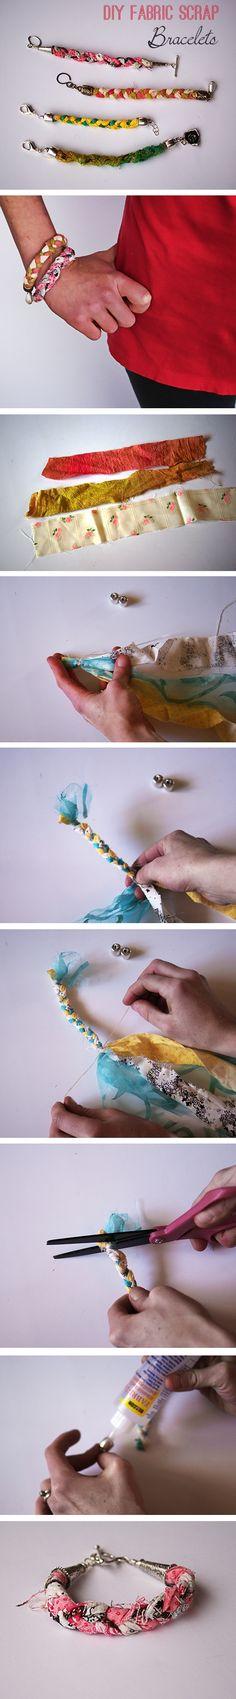 Easy Scrap Fabric Bracelet DIY